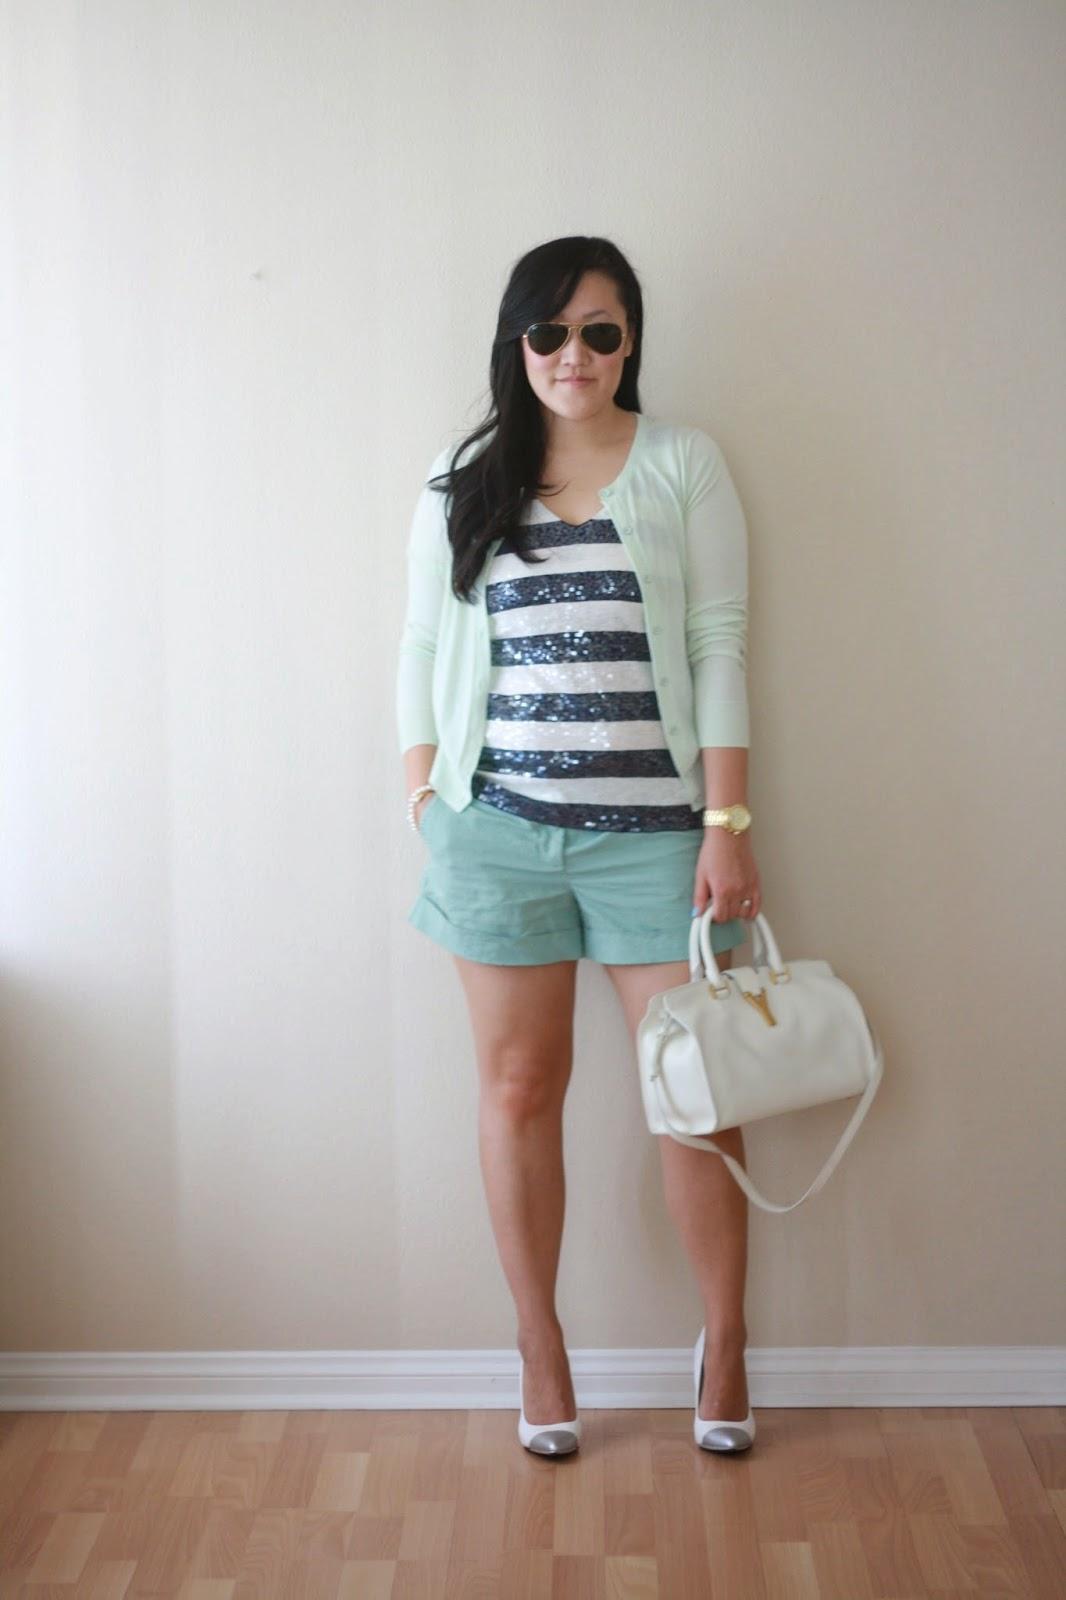 blogger, california blogger, style blogger, fashion blogger, simplyxclassic, jcrew, ysl, cabas